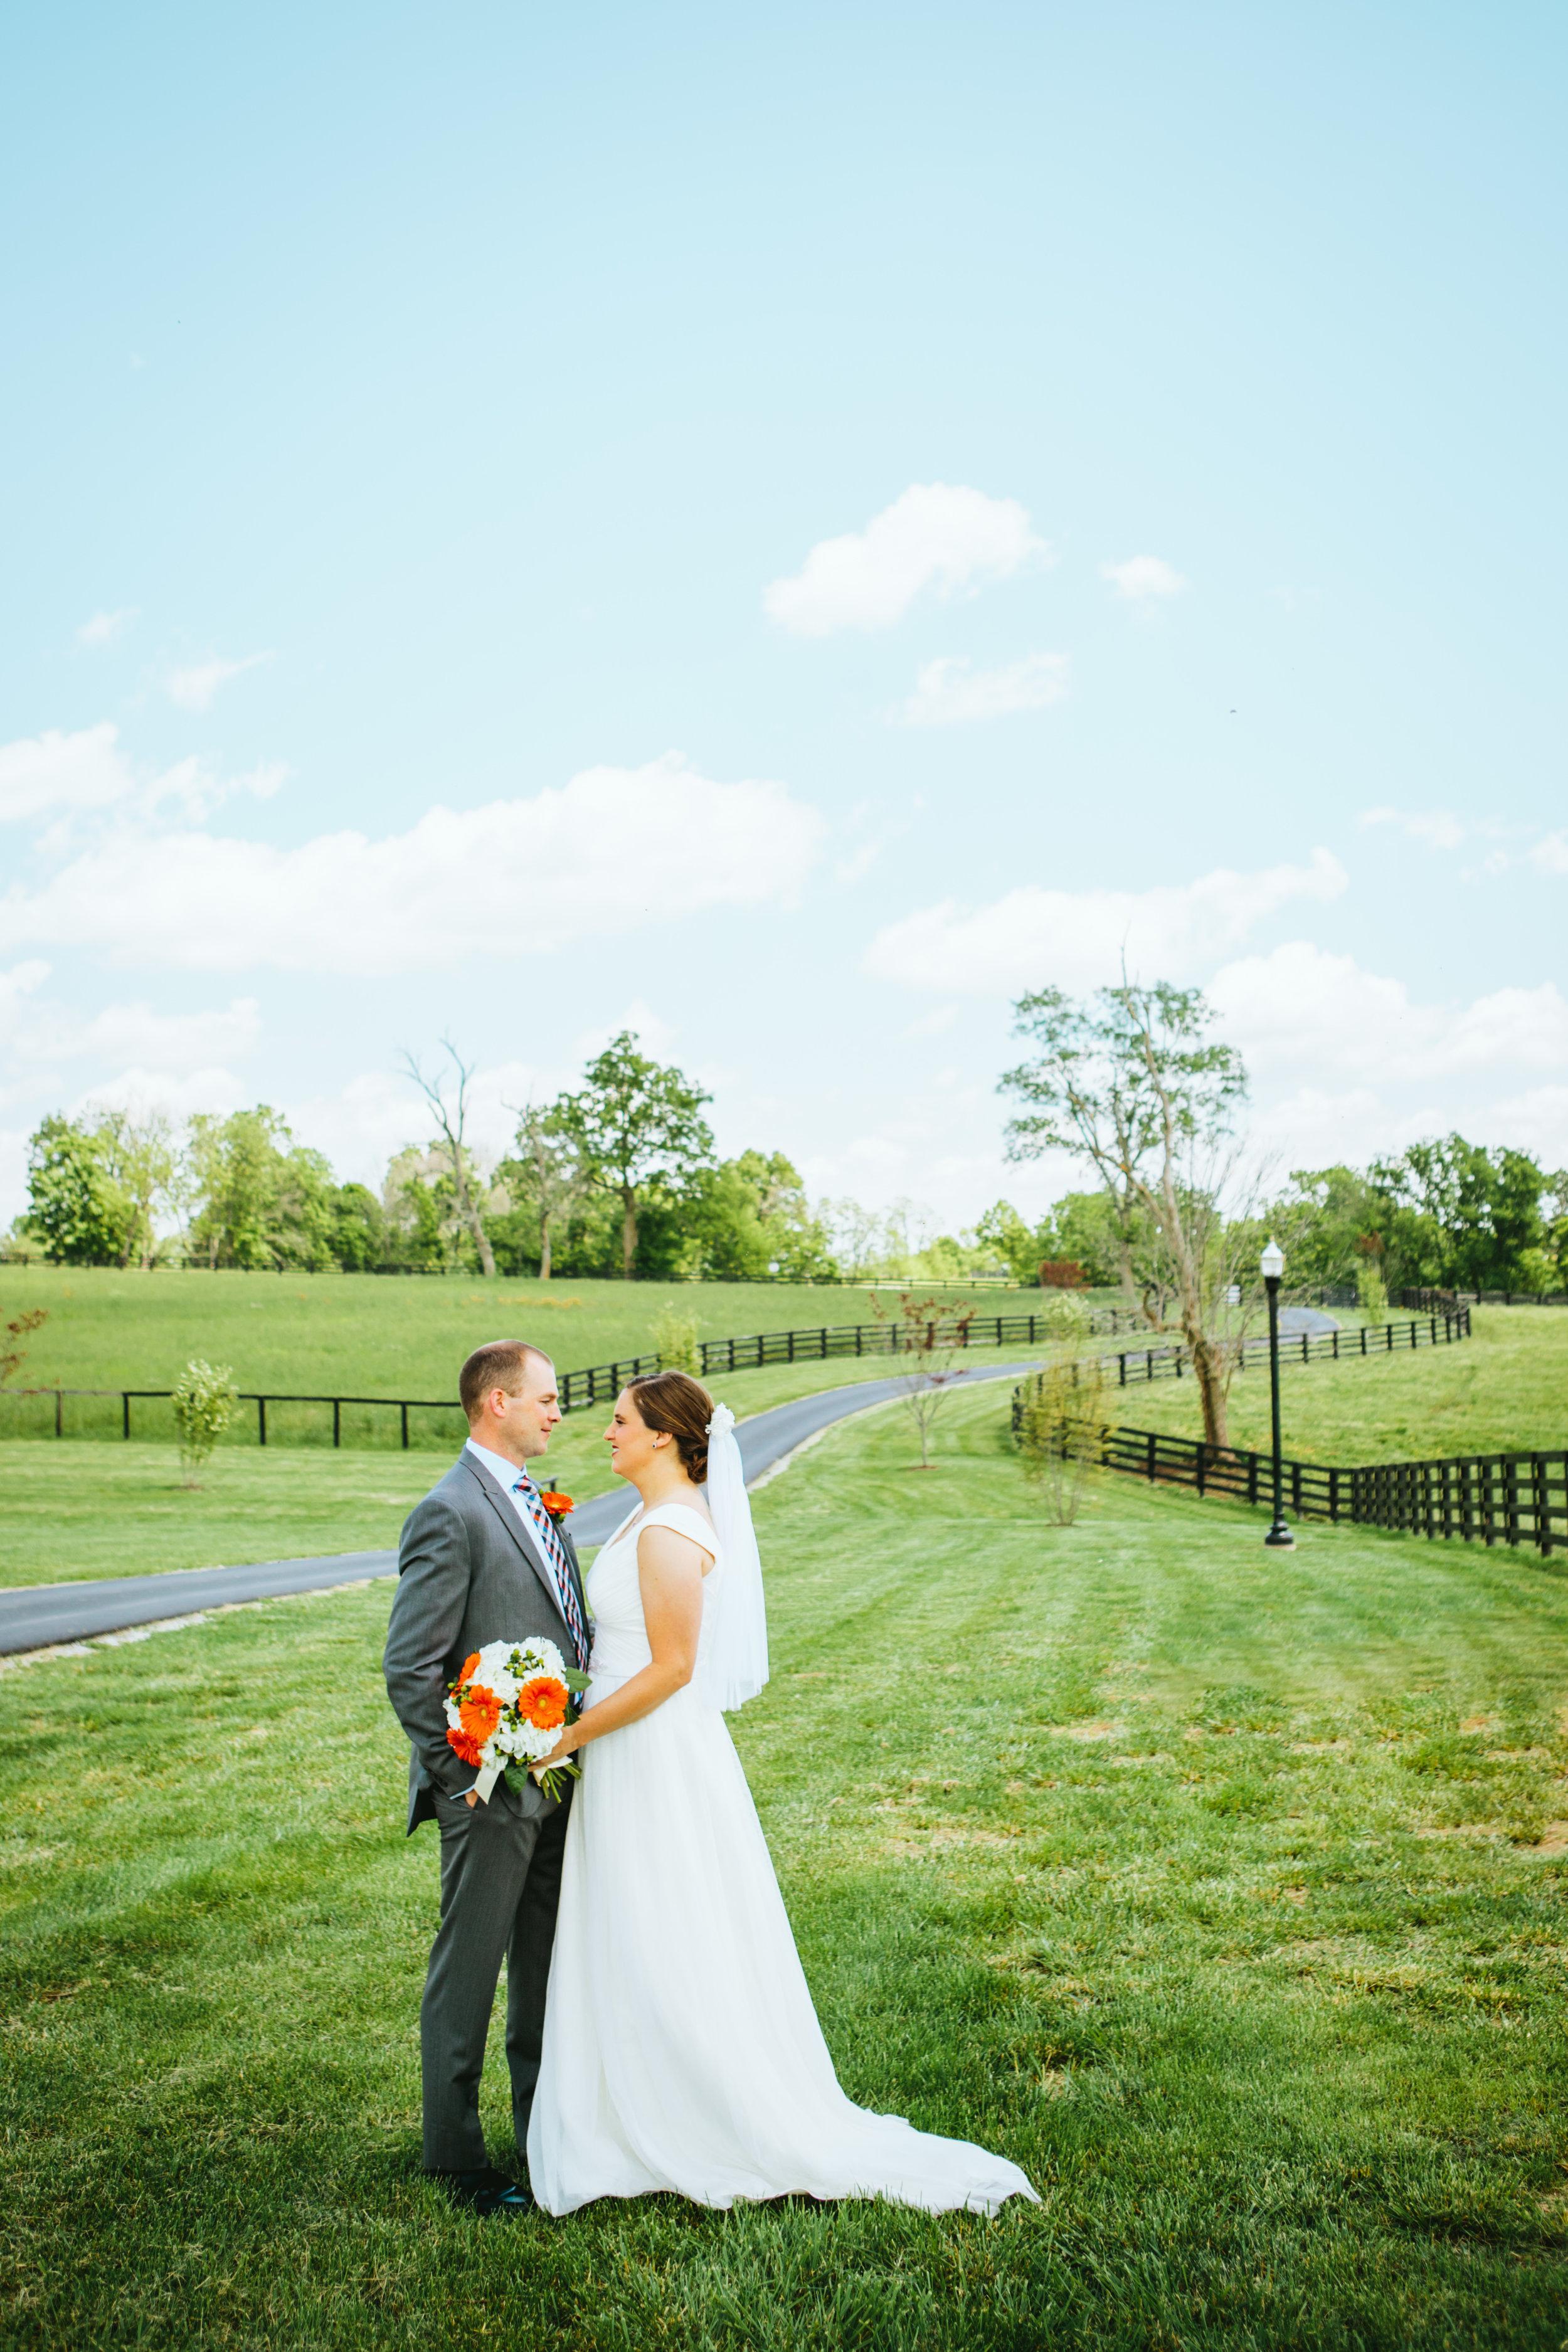 Whitesell-Mattioda Wedding-242.jpg